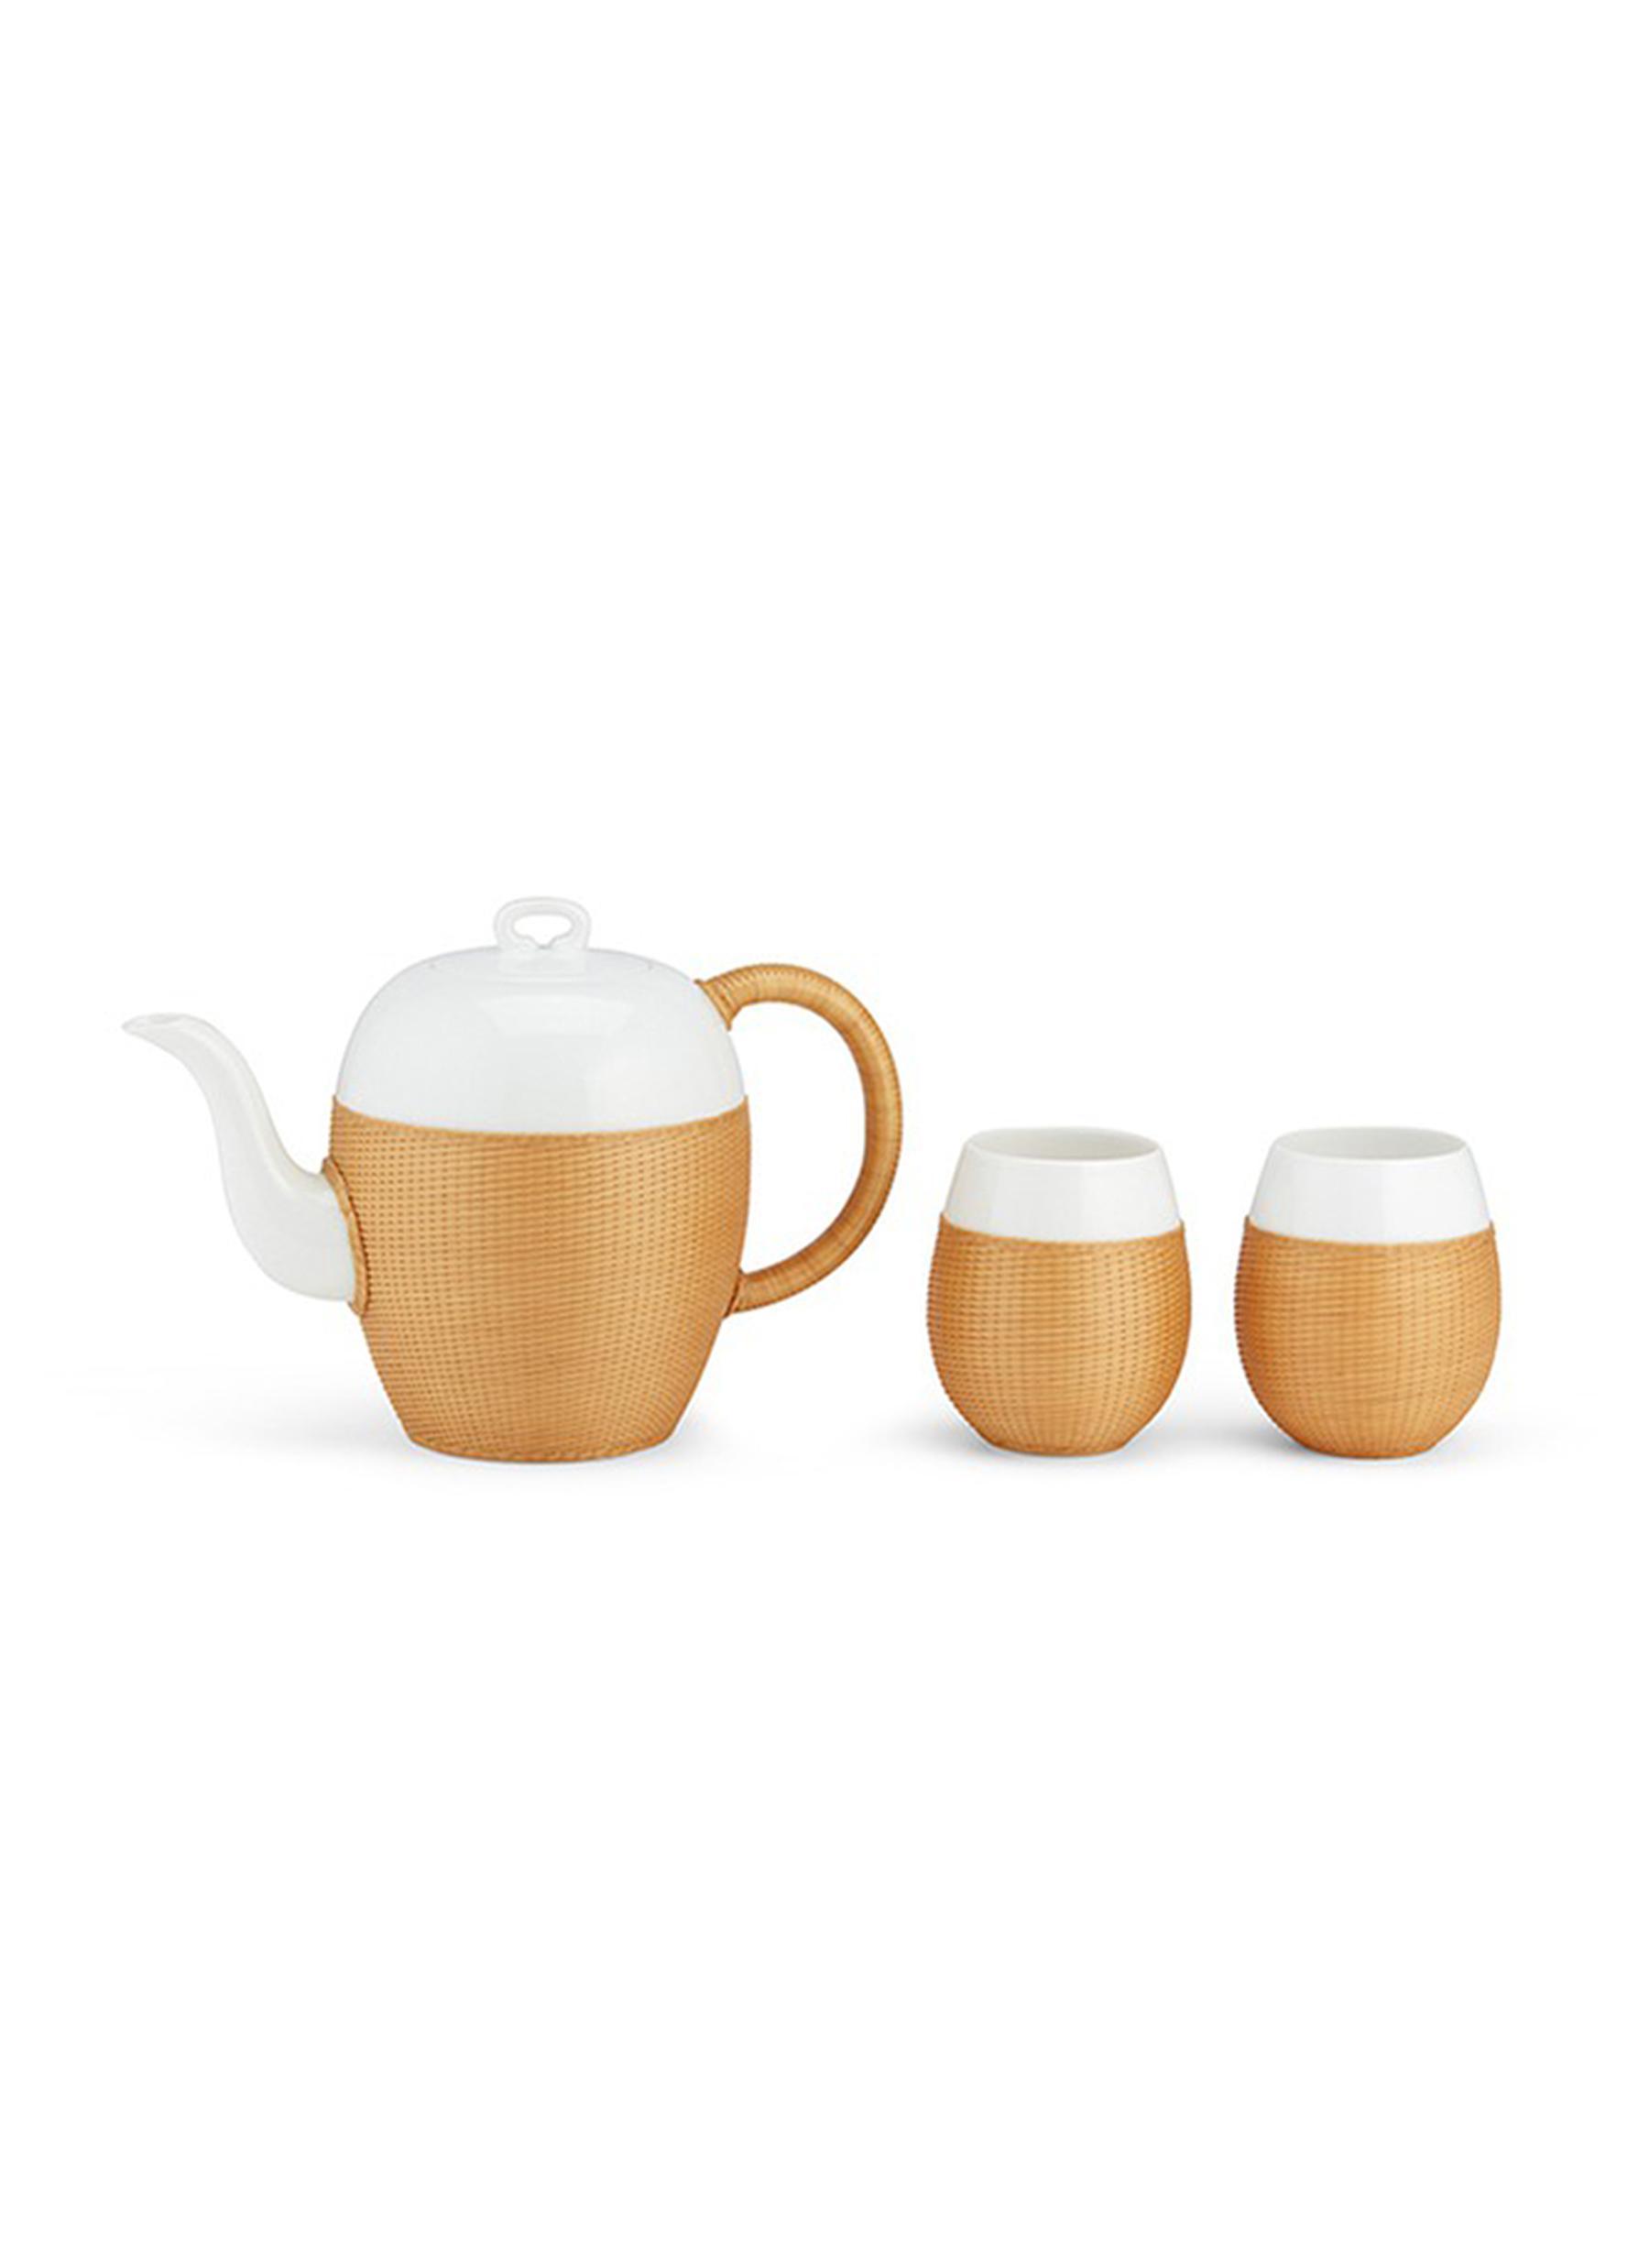 Bridge tea set by SHANG XIA